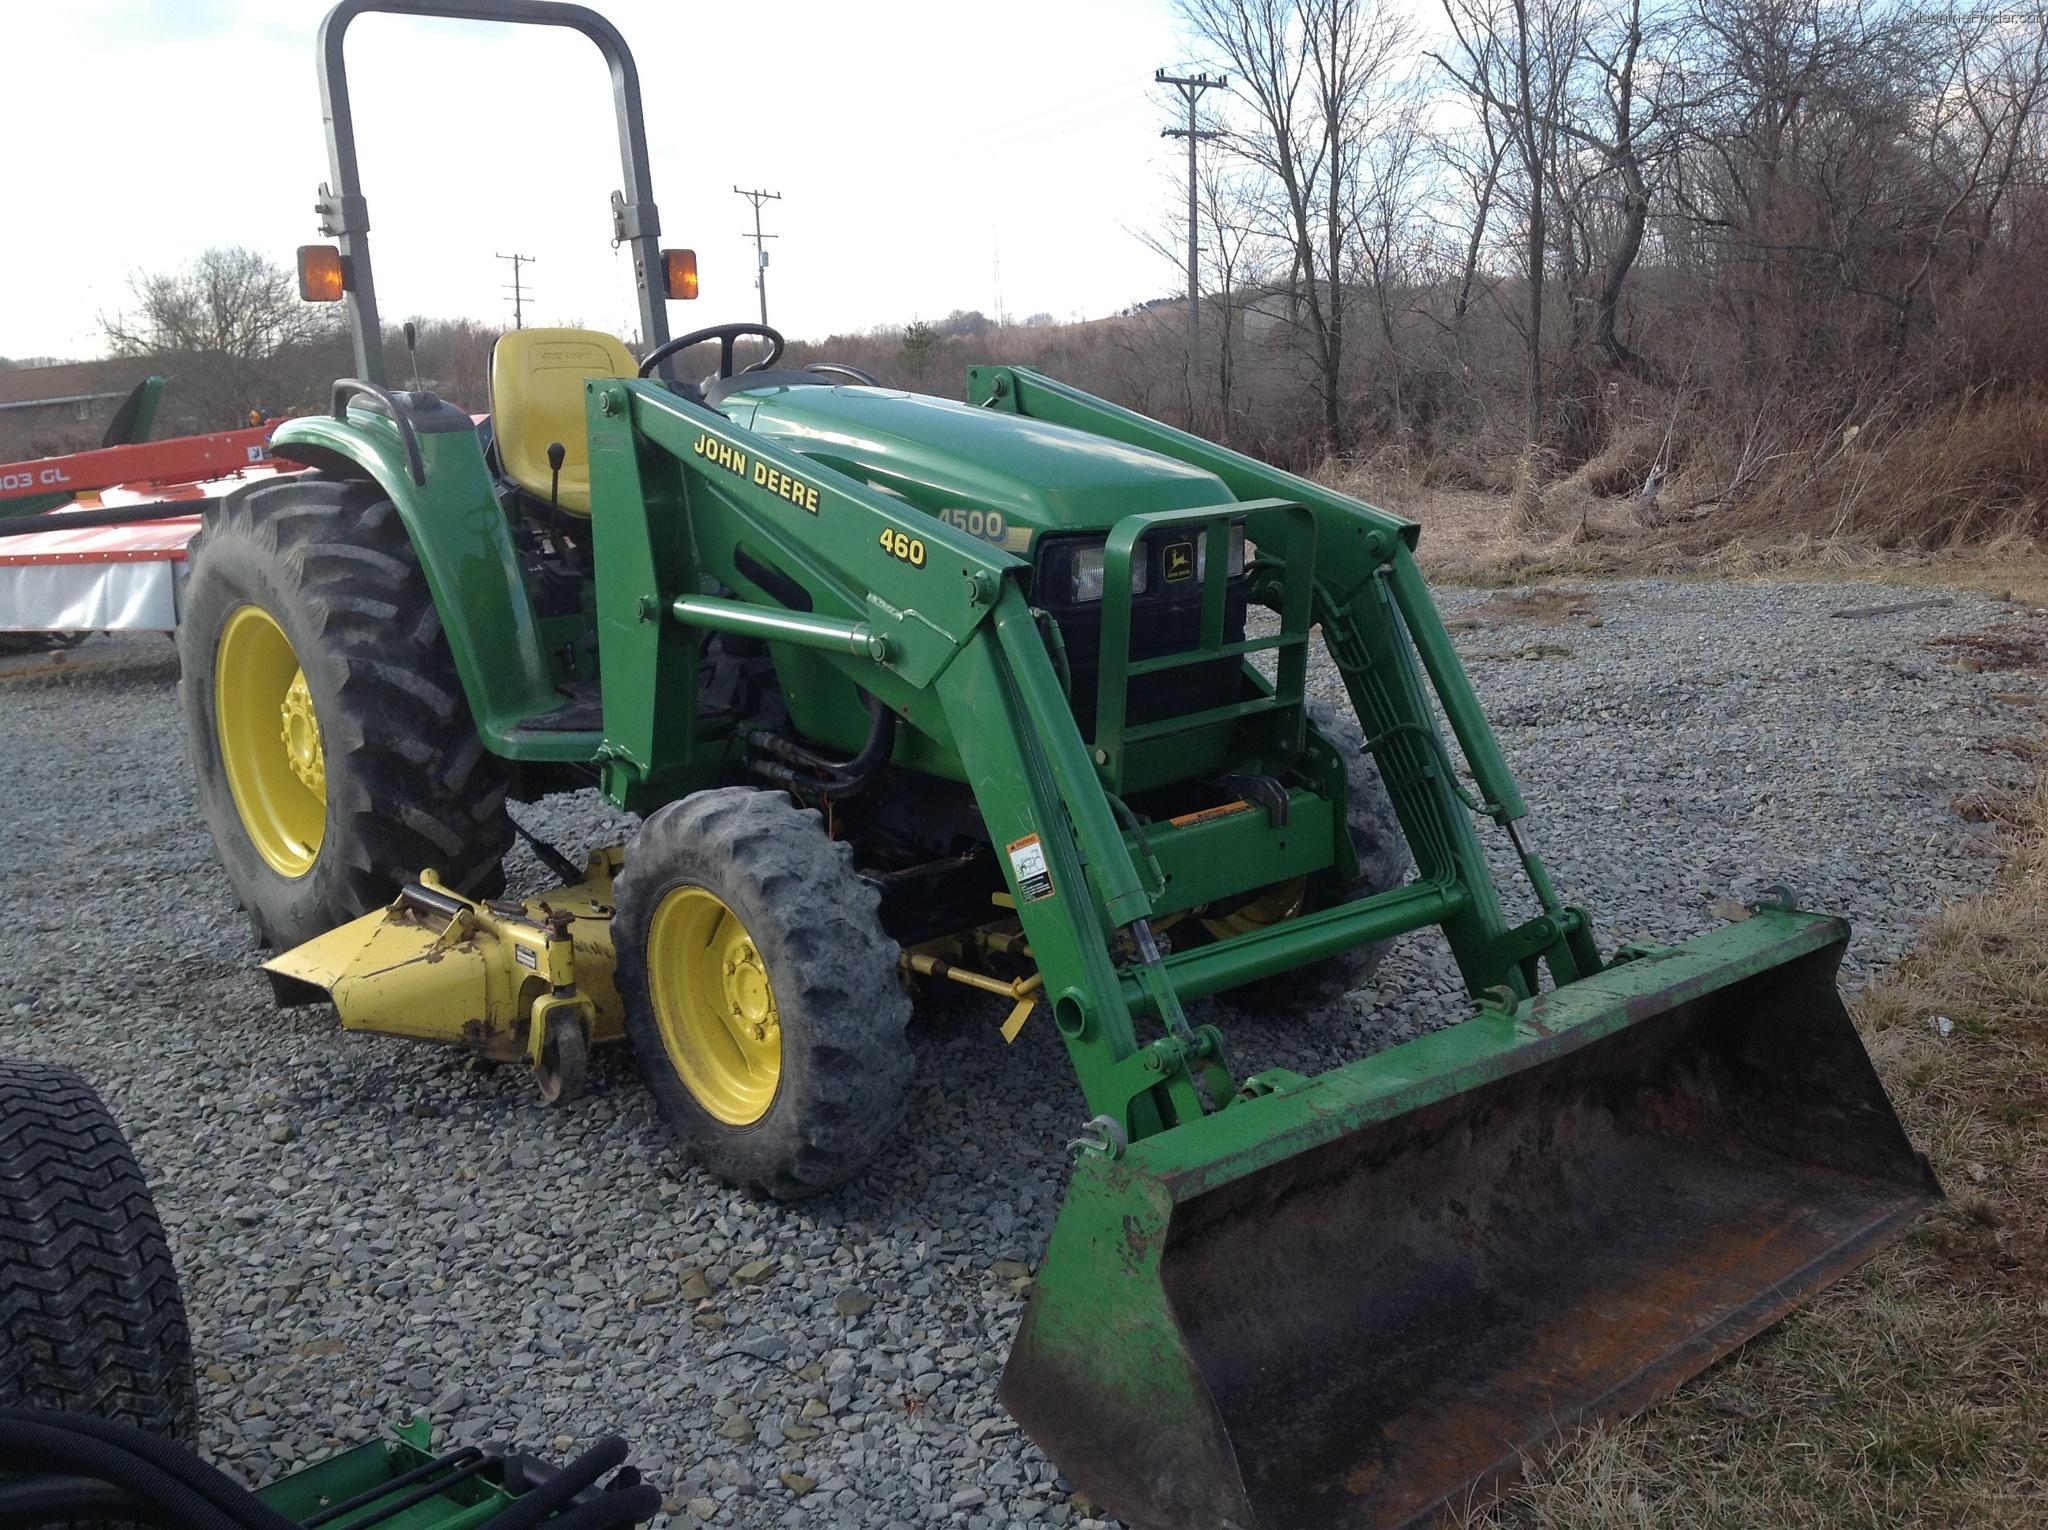 1998 John Deere 4500 Tractors - Compact (1-40hp.) - John ...